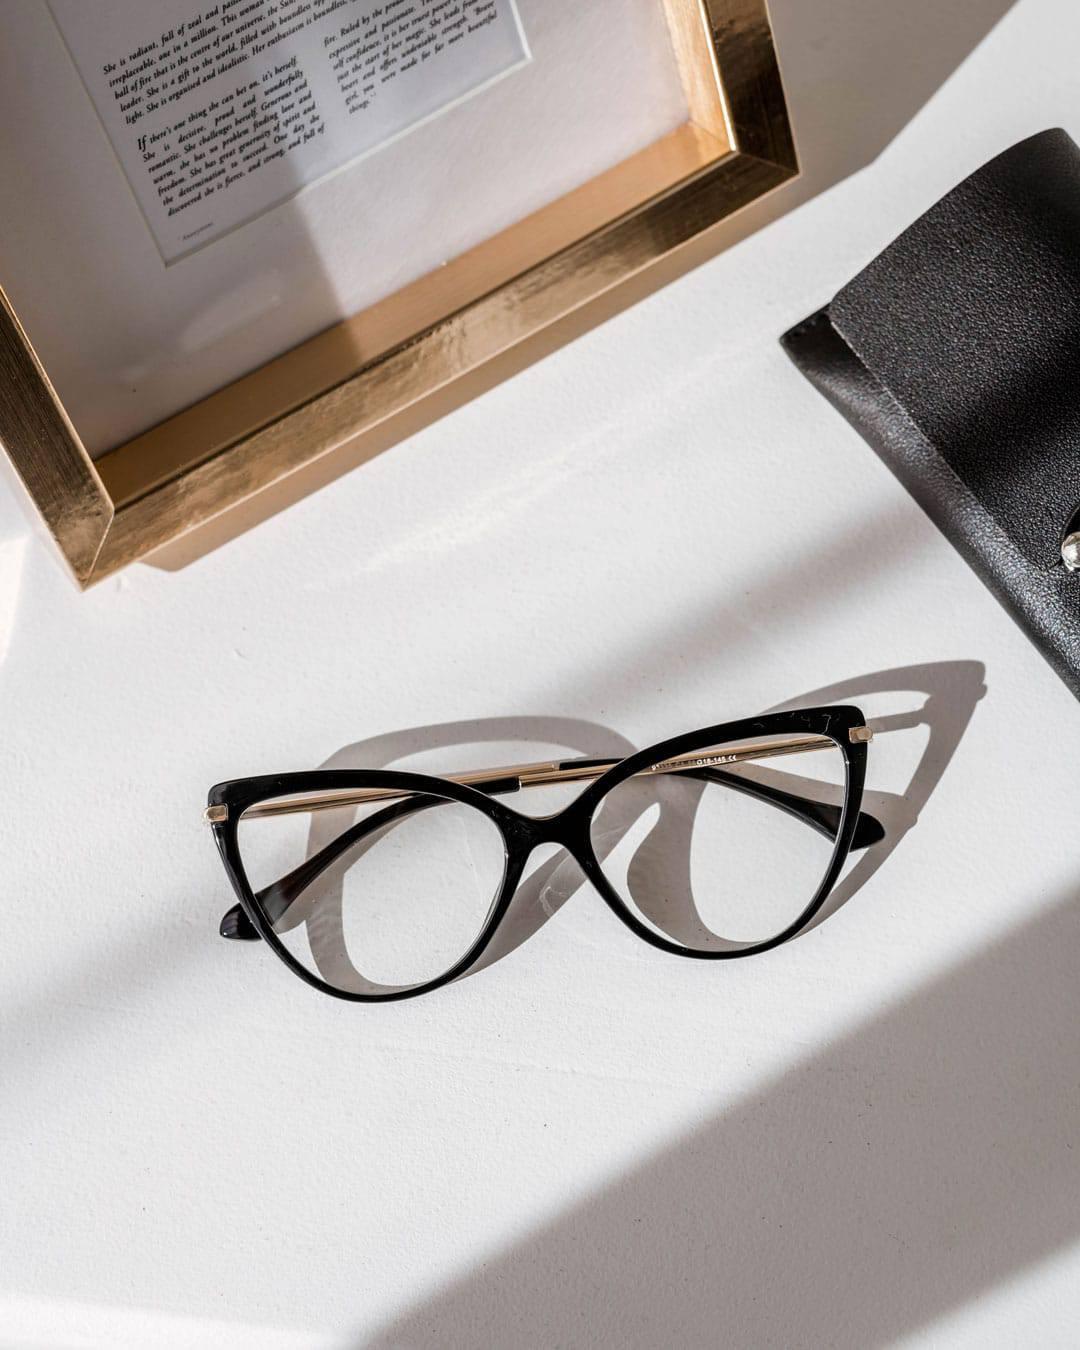 Cateye black blue light blocking glasses